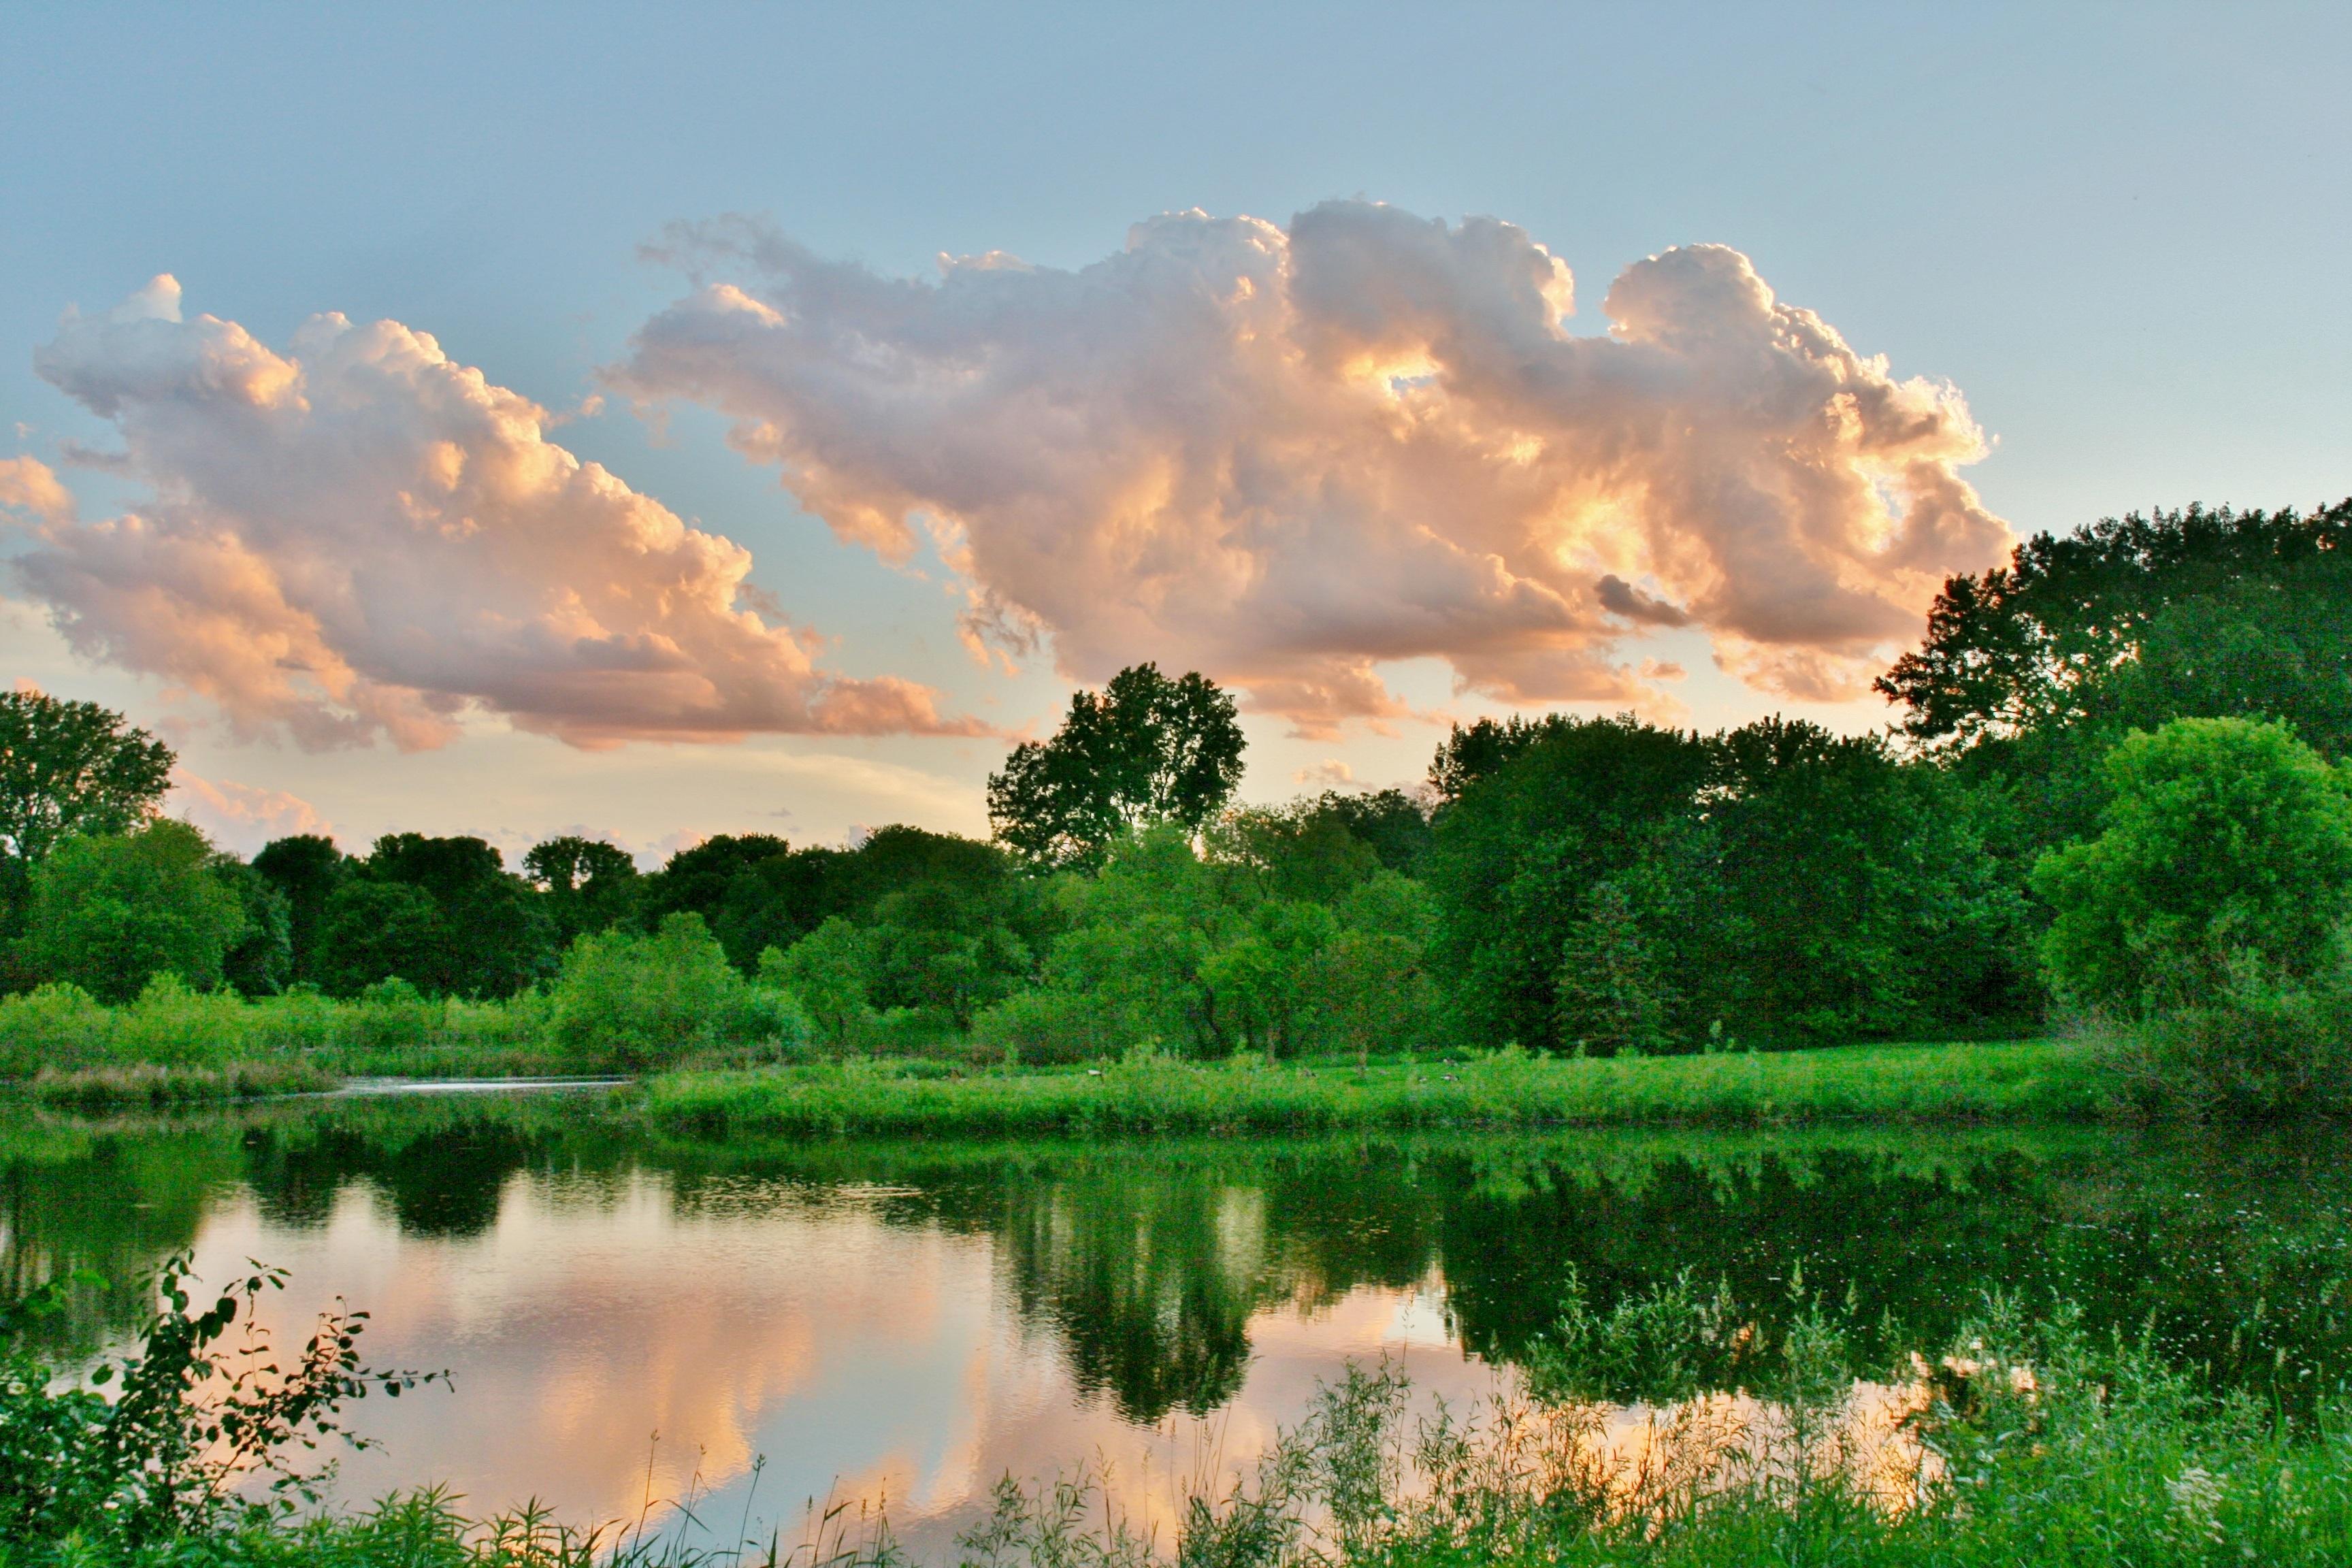 комнаты альковом картинки небо трава вода эти слухи